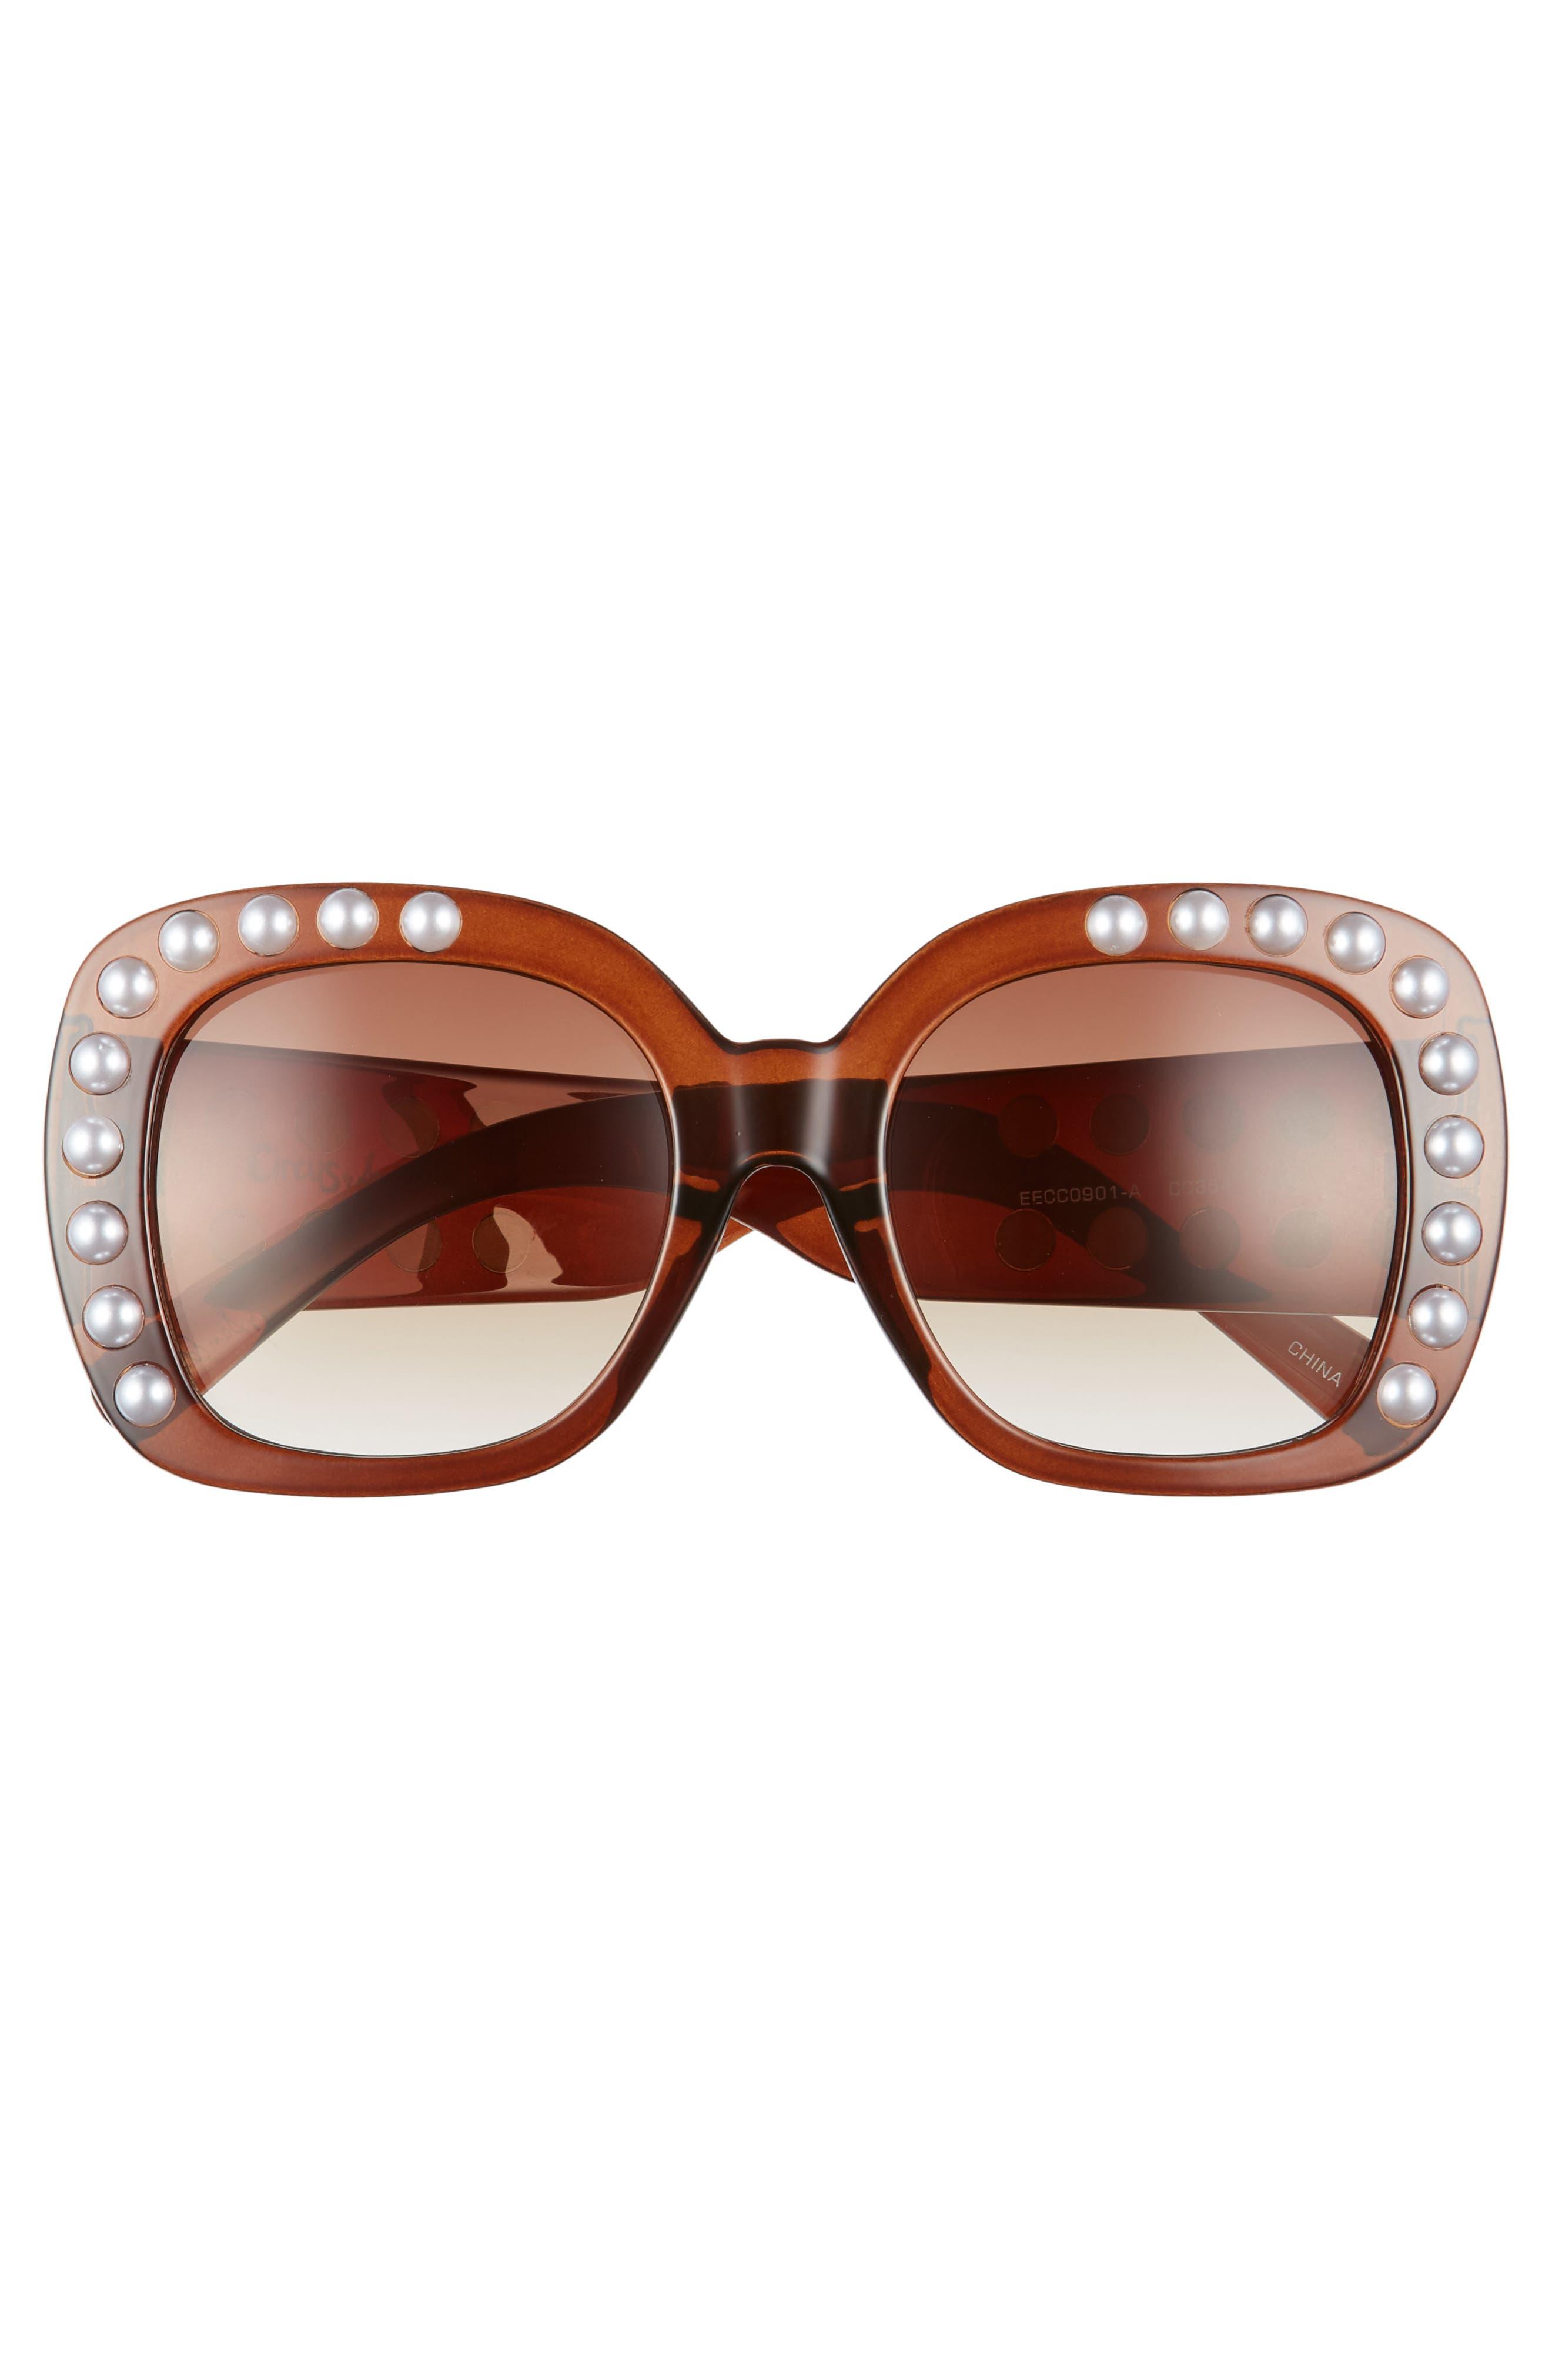 53mm Imitation Pearl Sunglasses,                             Alternate thumbnail 8, color,